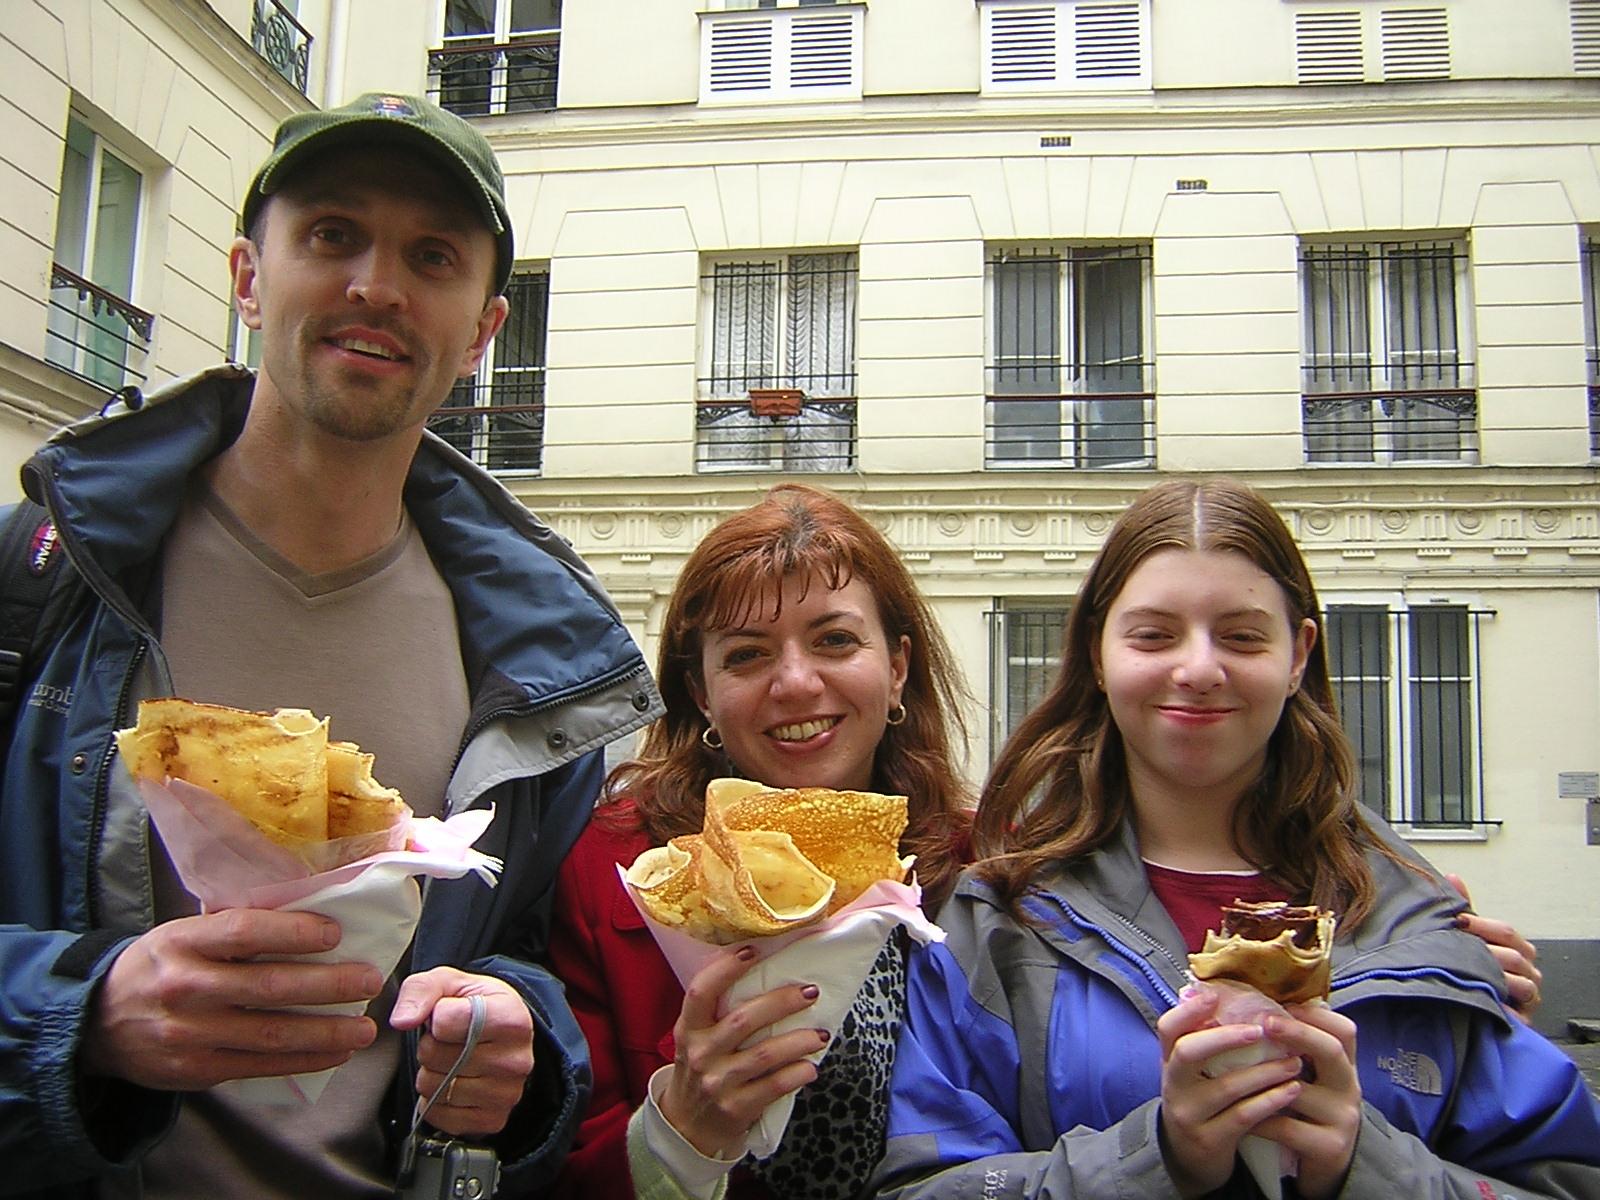 Boris Naronov and Family 28 April 05 b.jpg